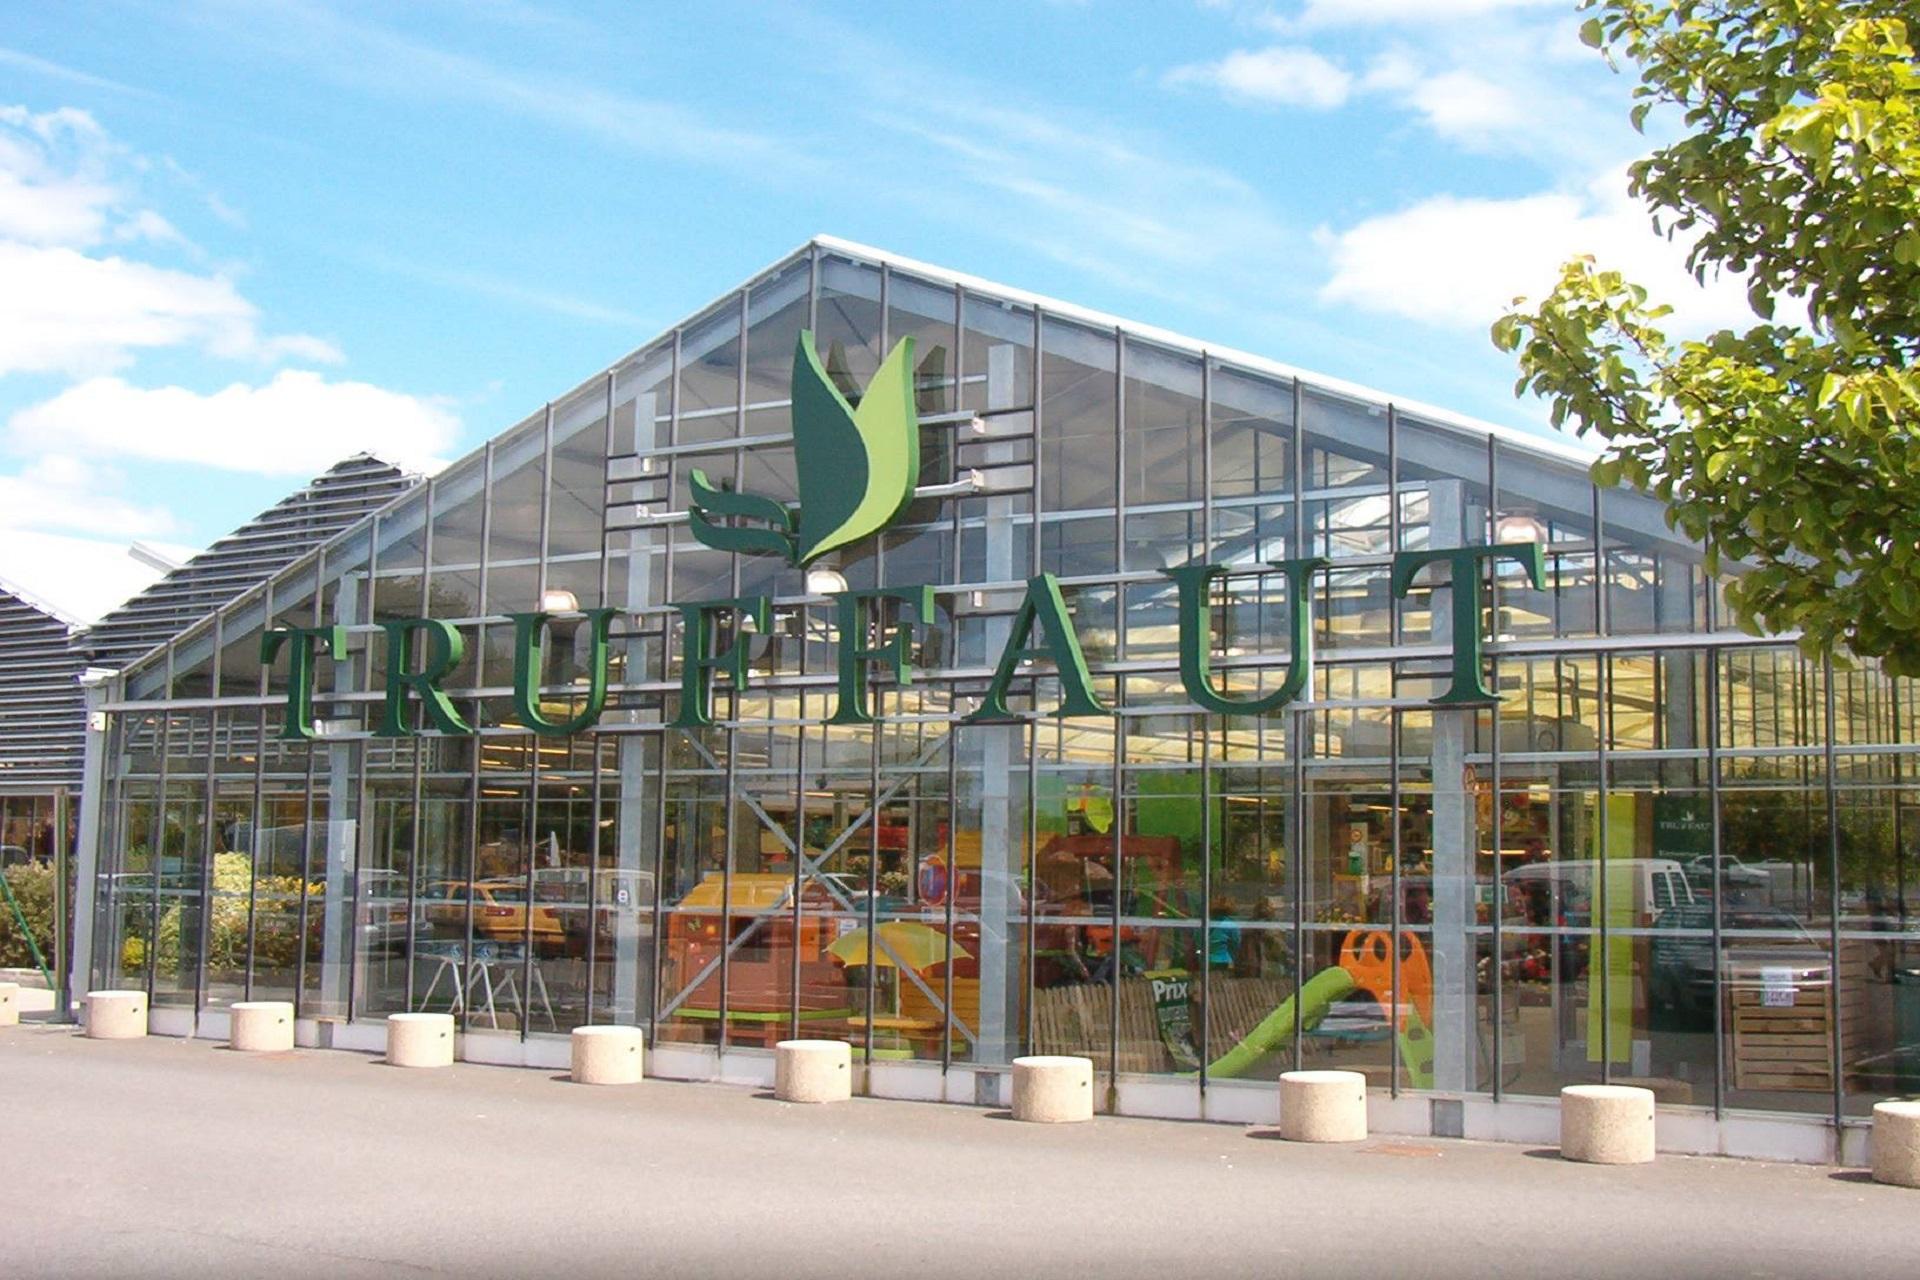 Truffaut Quimper Jardinerie Animalerie Deco Maison Loisirs